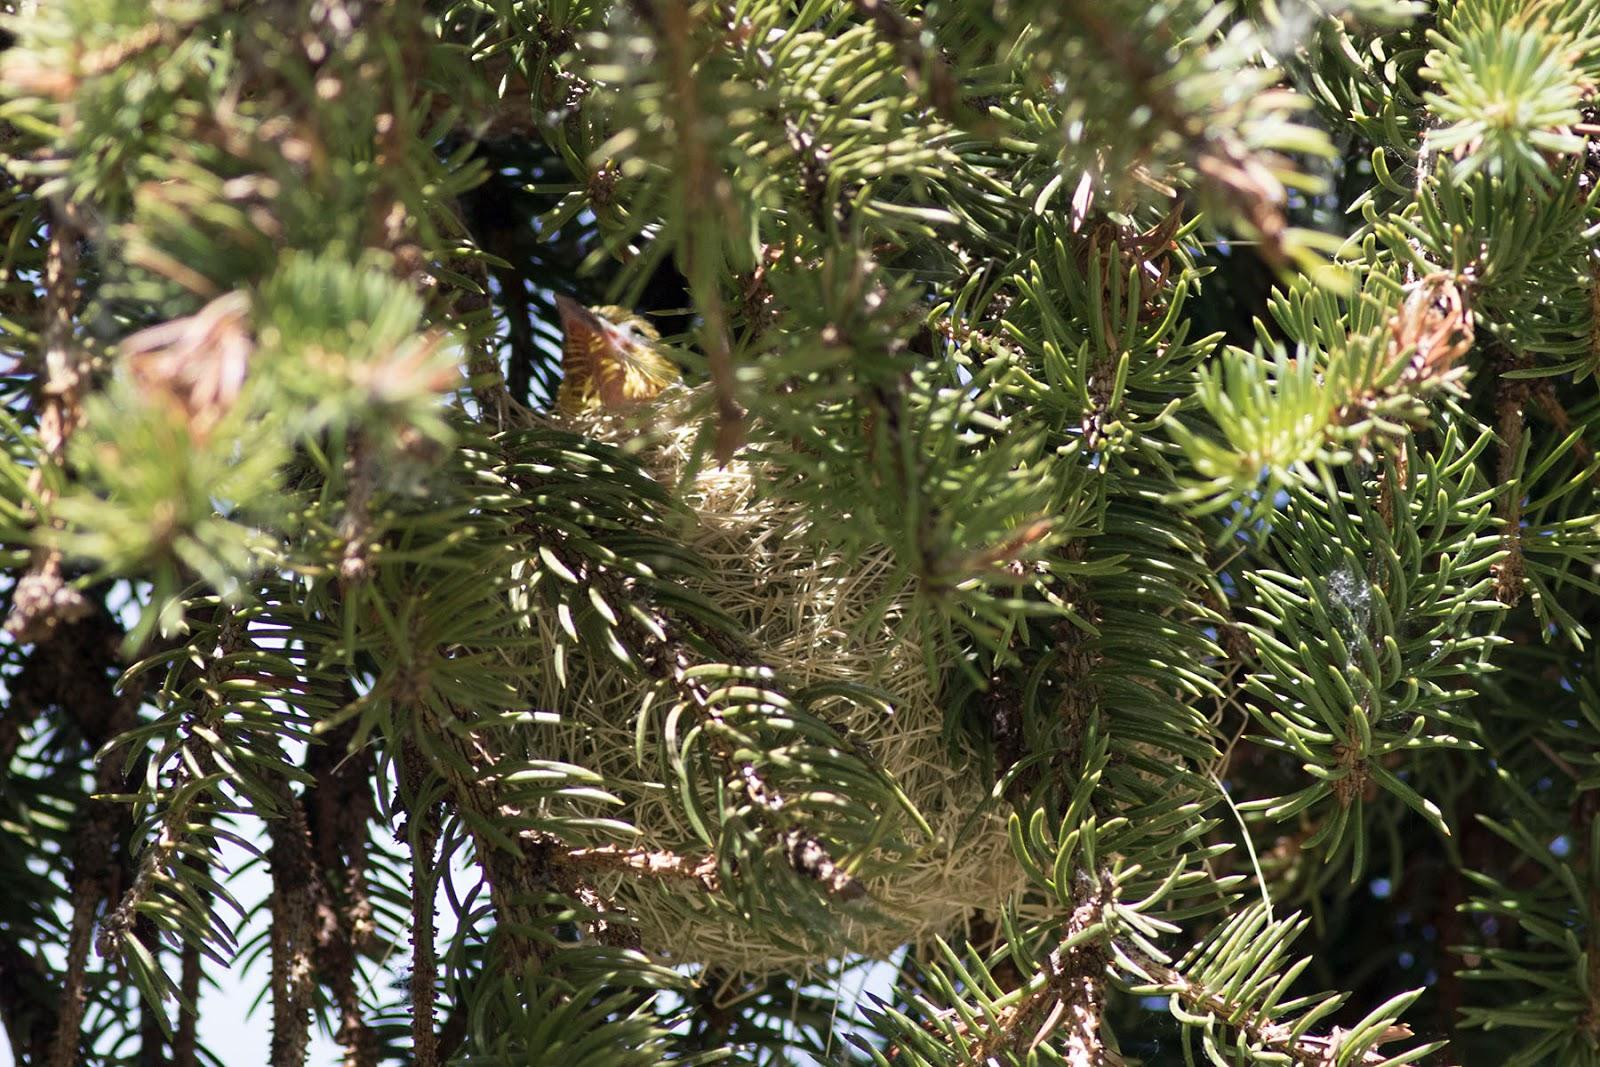 Orchard Oriole Nest - photo#18